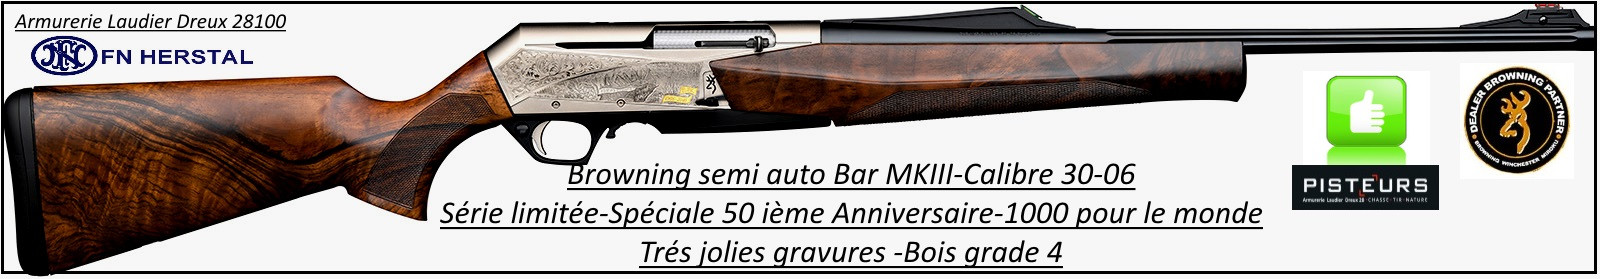 Carabine-Browning -semi auto-BAR MK III-50 ième Anniversaire-Bois grade 4-Cal 30-06 -Ref 27325